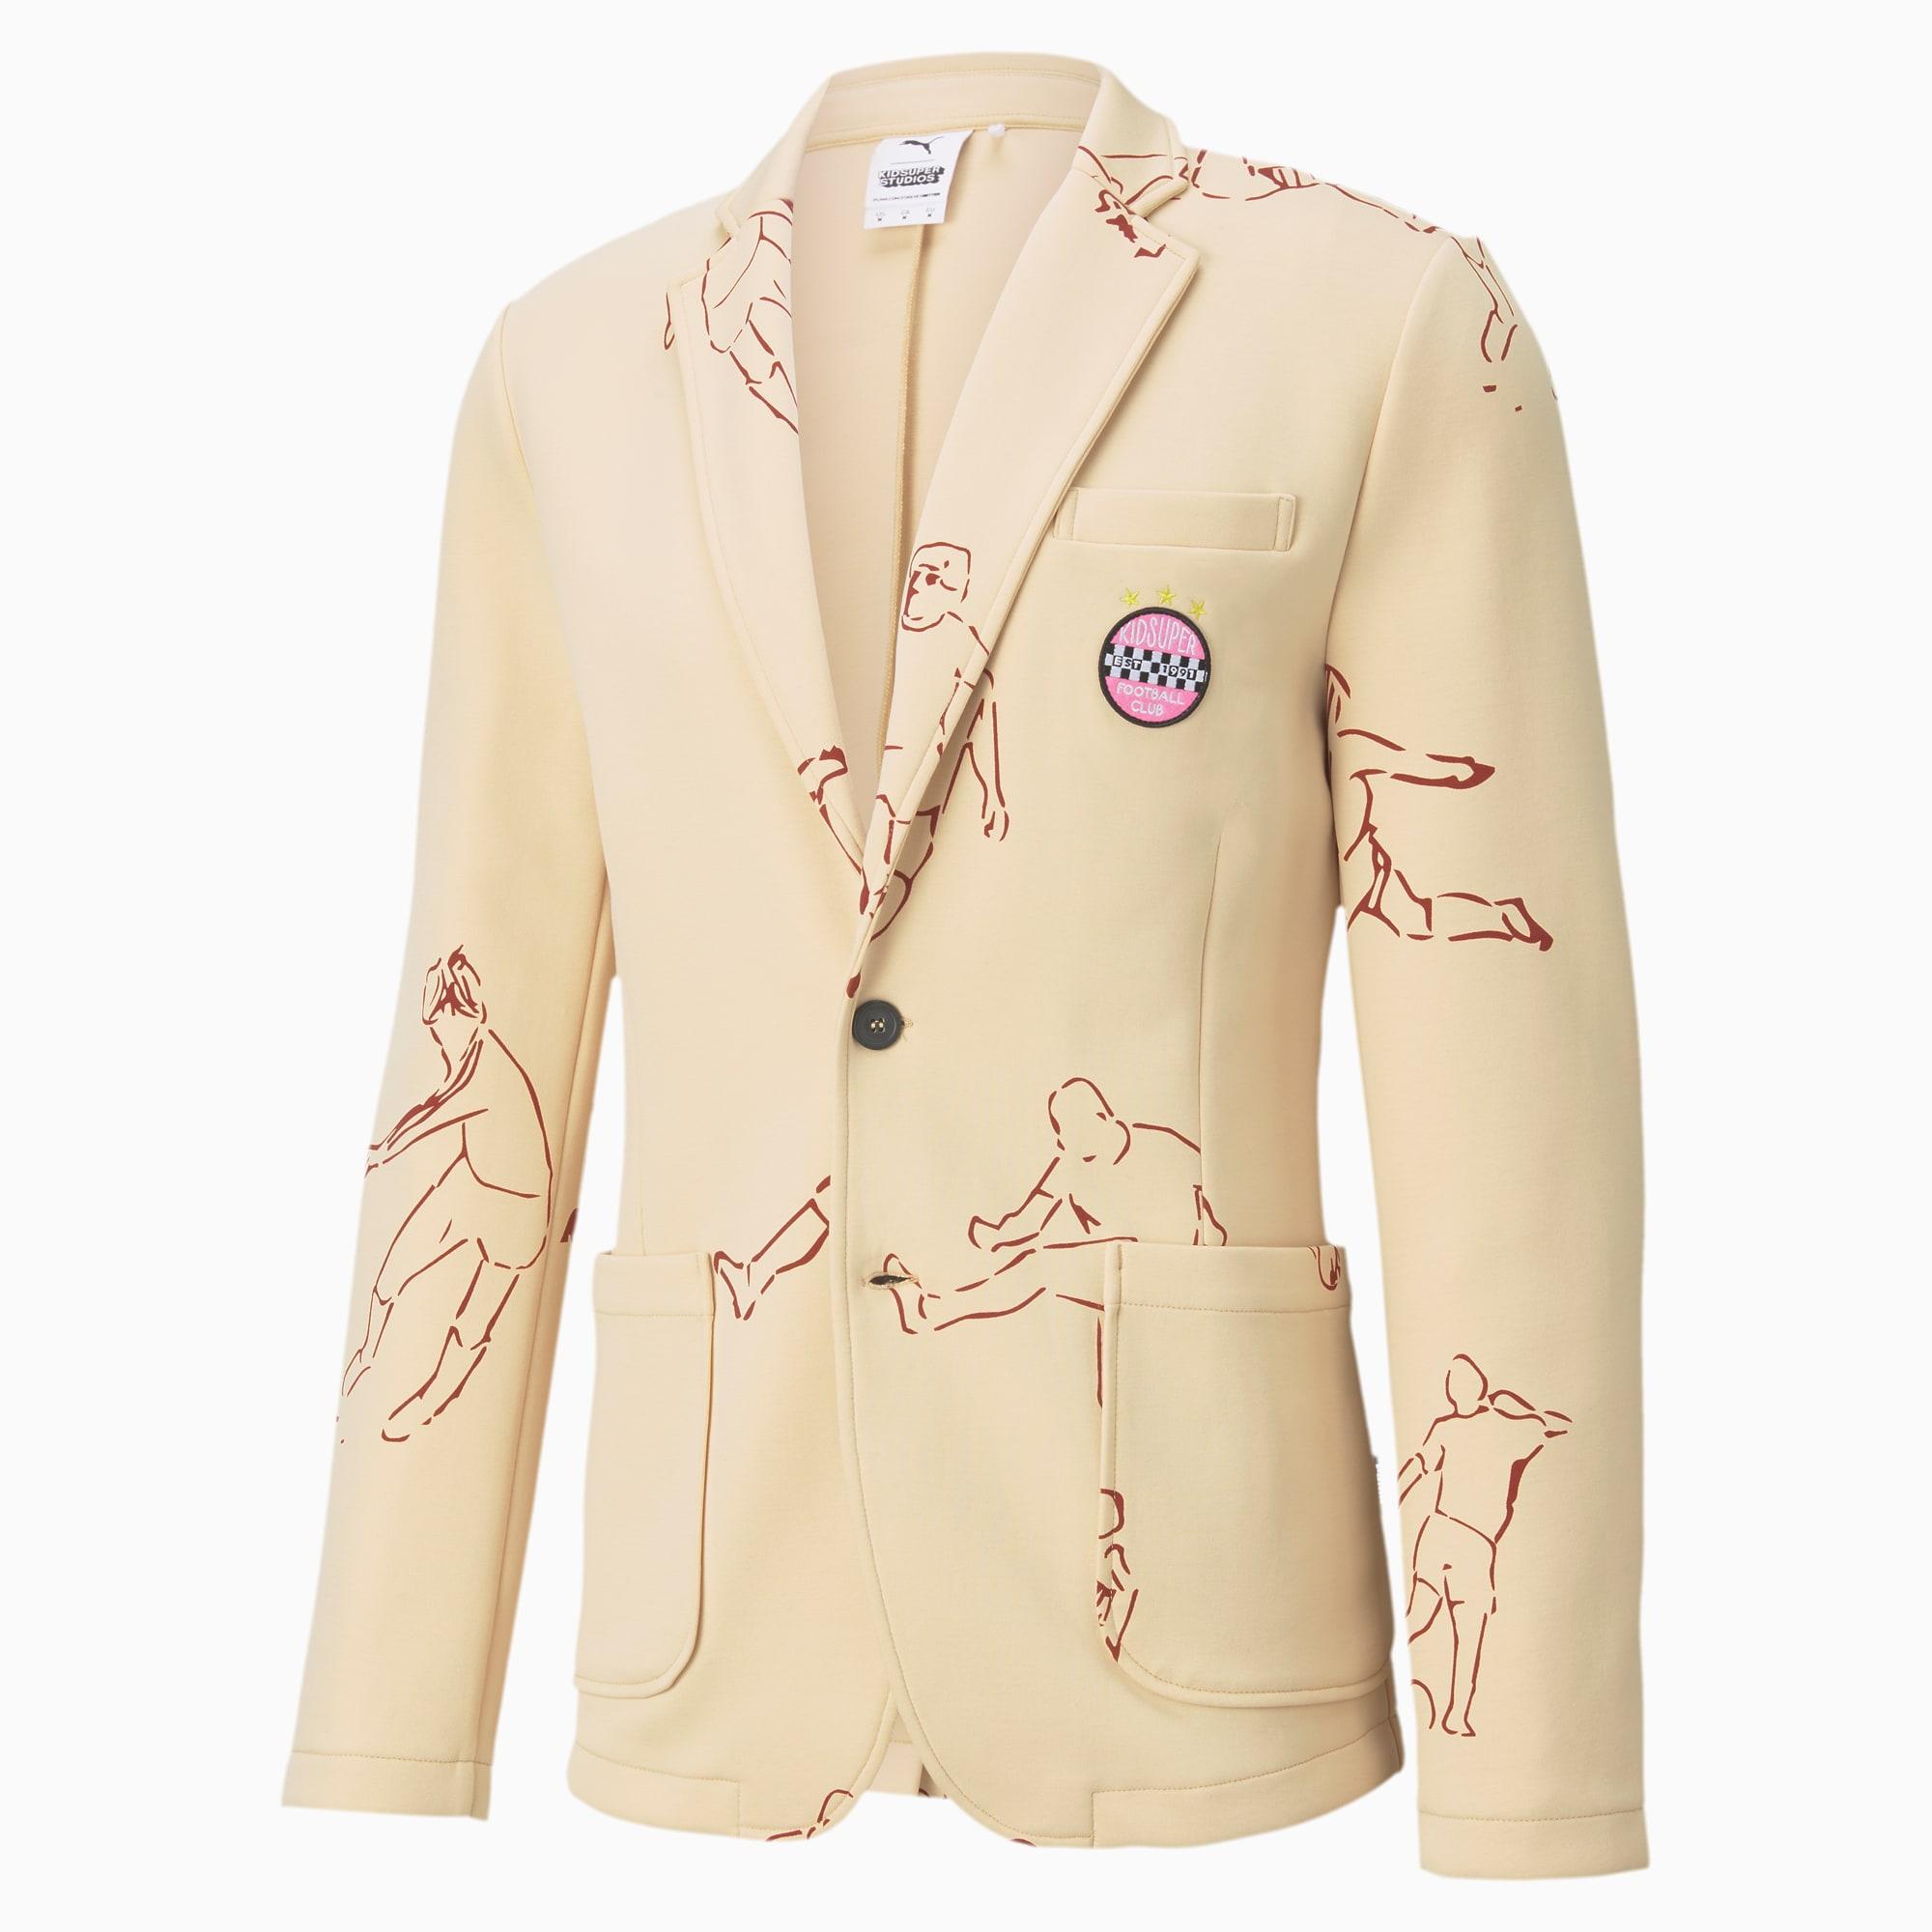 PUMA x KIDSUPER Men's Tailored Jacket